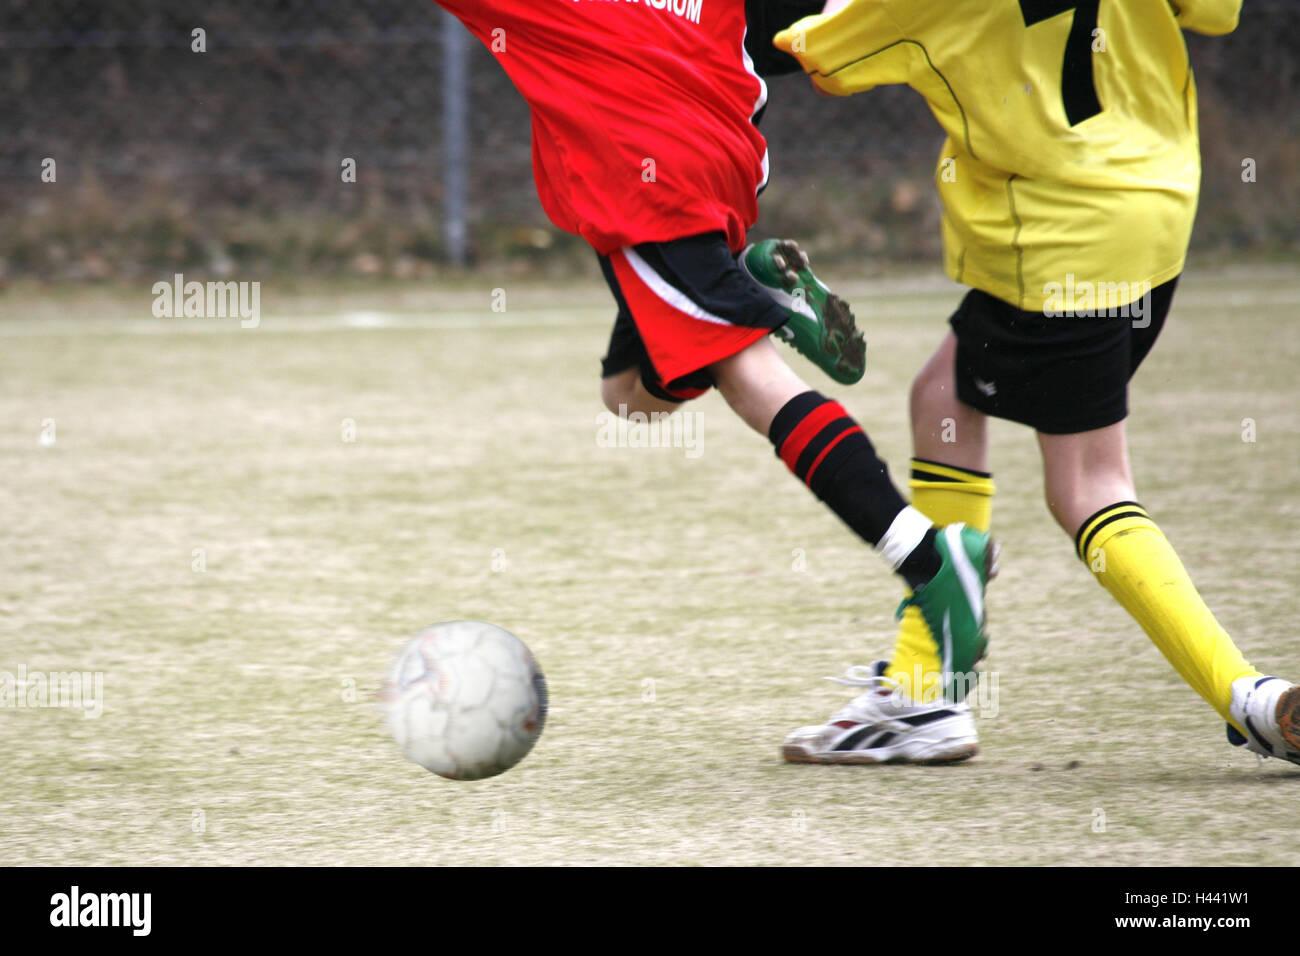 Fußball, junge, Spielszene, Foul, Detail, Schüler Turnier, Turnier, Kunstrasen, Verteidigung, Foul, Spiel, Stockbild